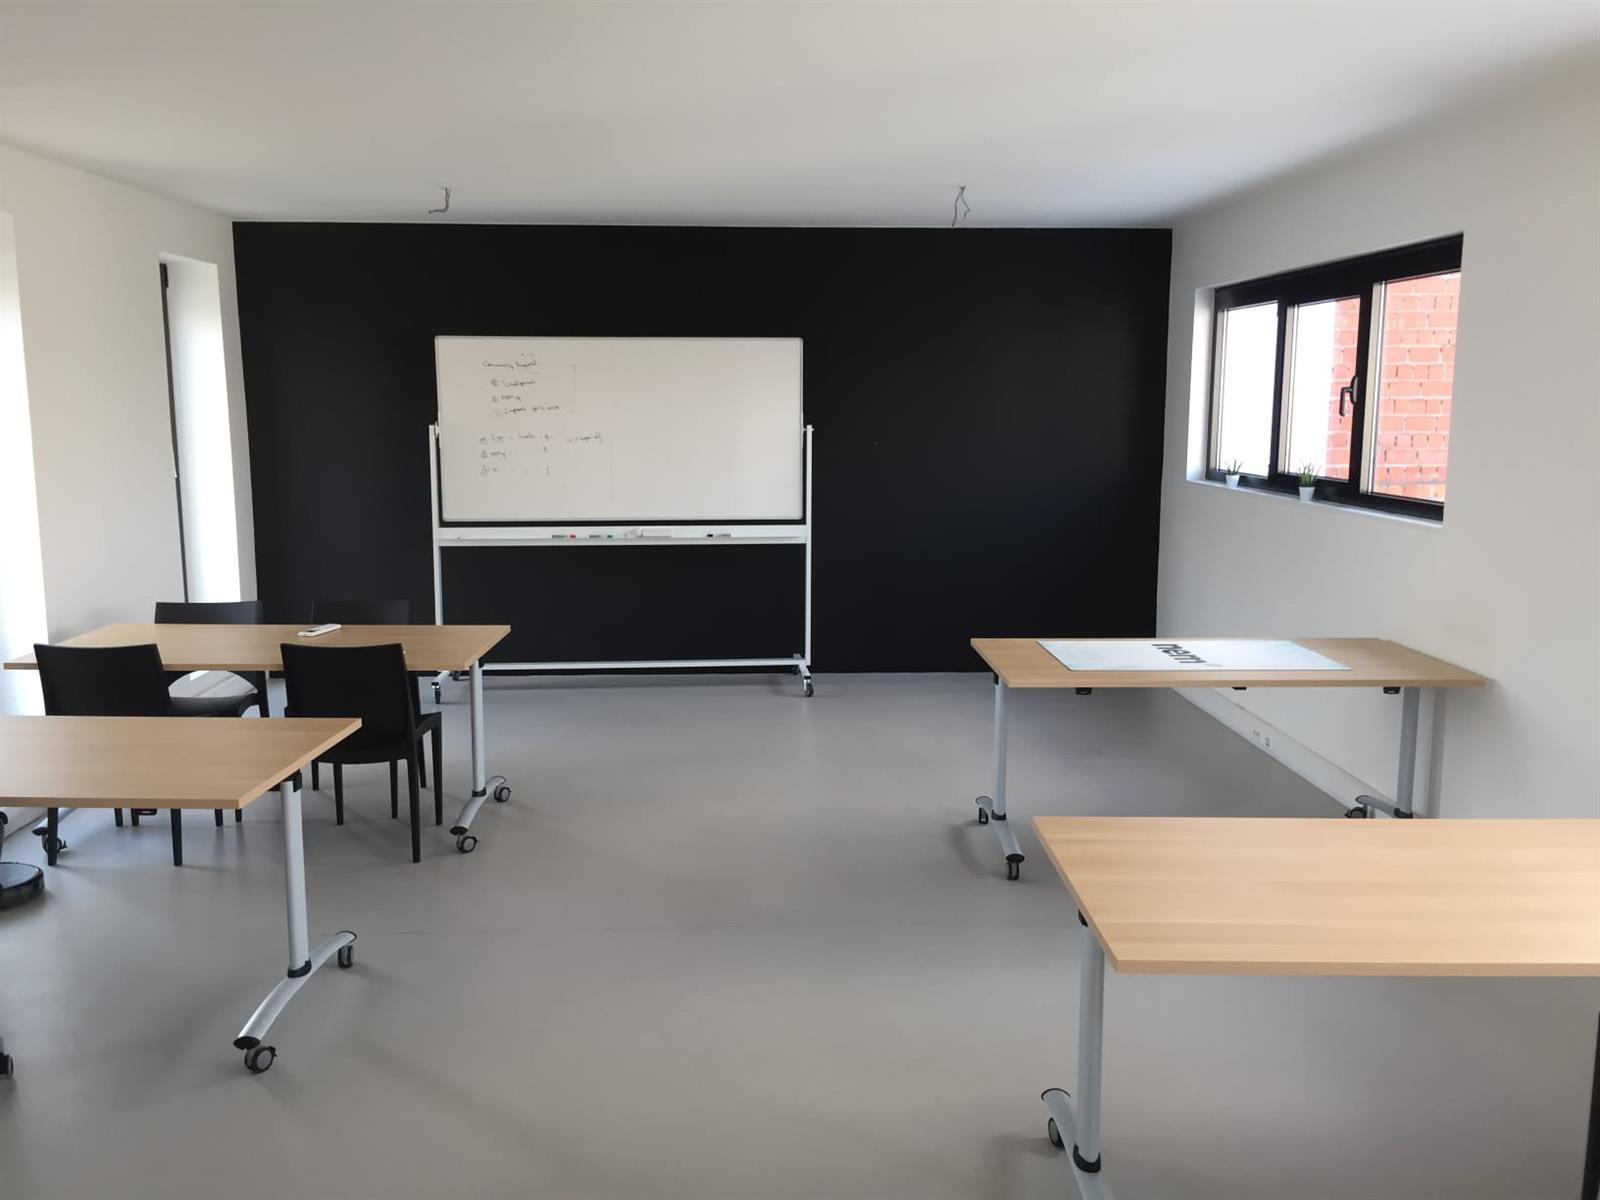 kantoor te huur K003 - Middelmolenlaan 96, 2100 Antwerpen Deurne, België 11